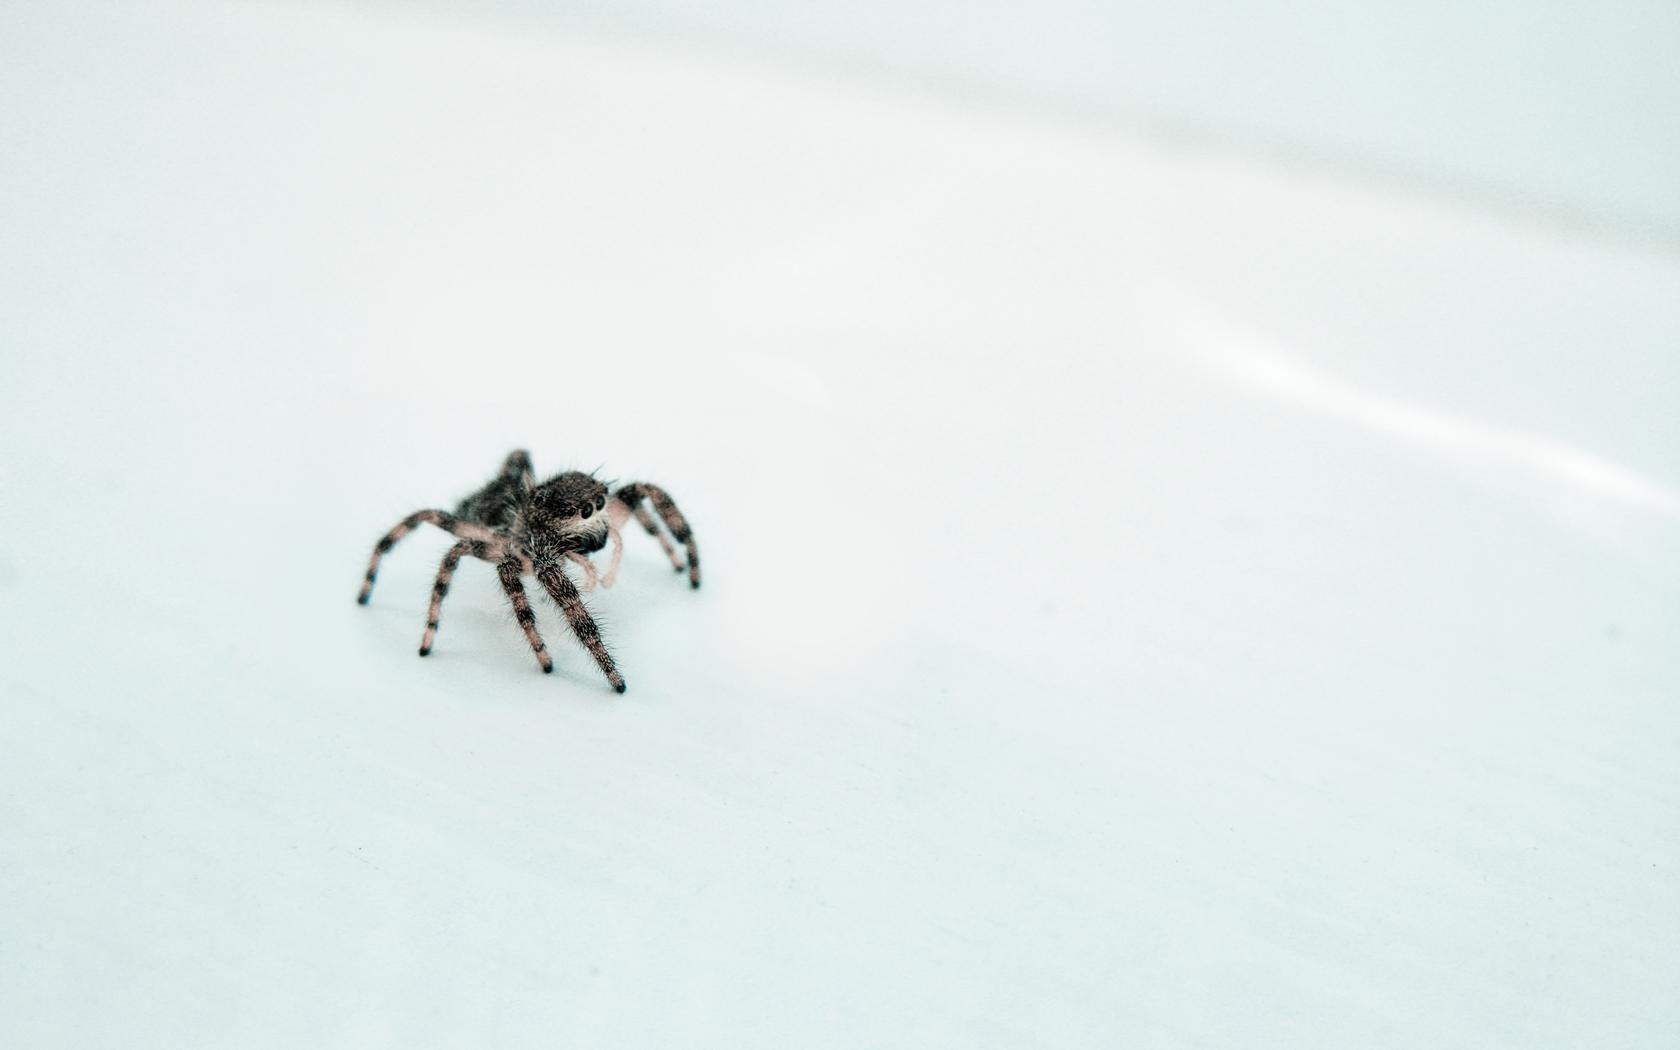 Лампа-паук бесплатно